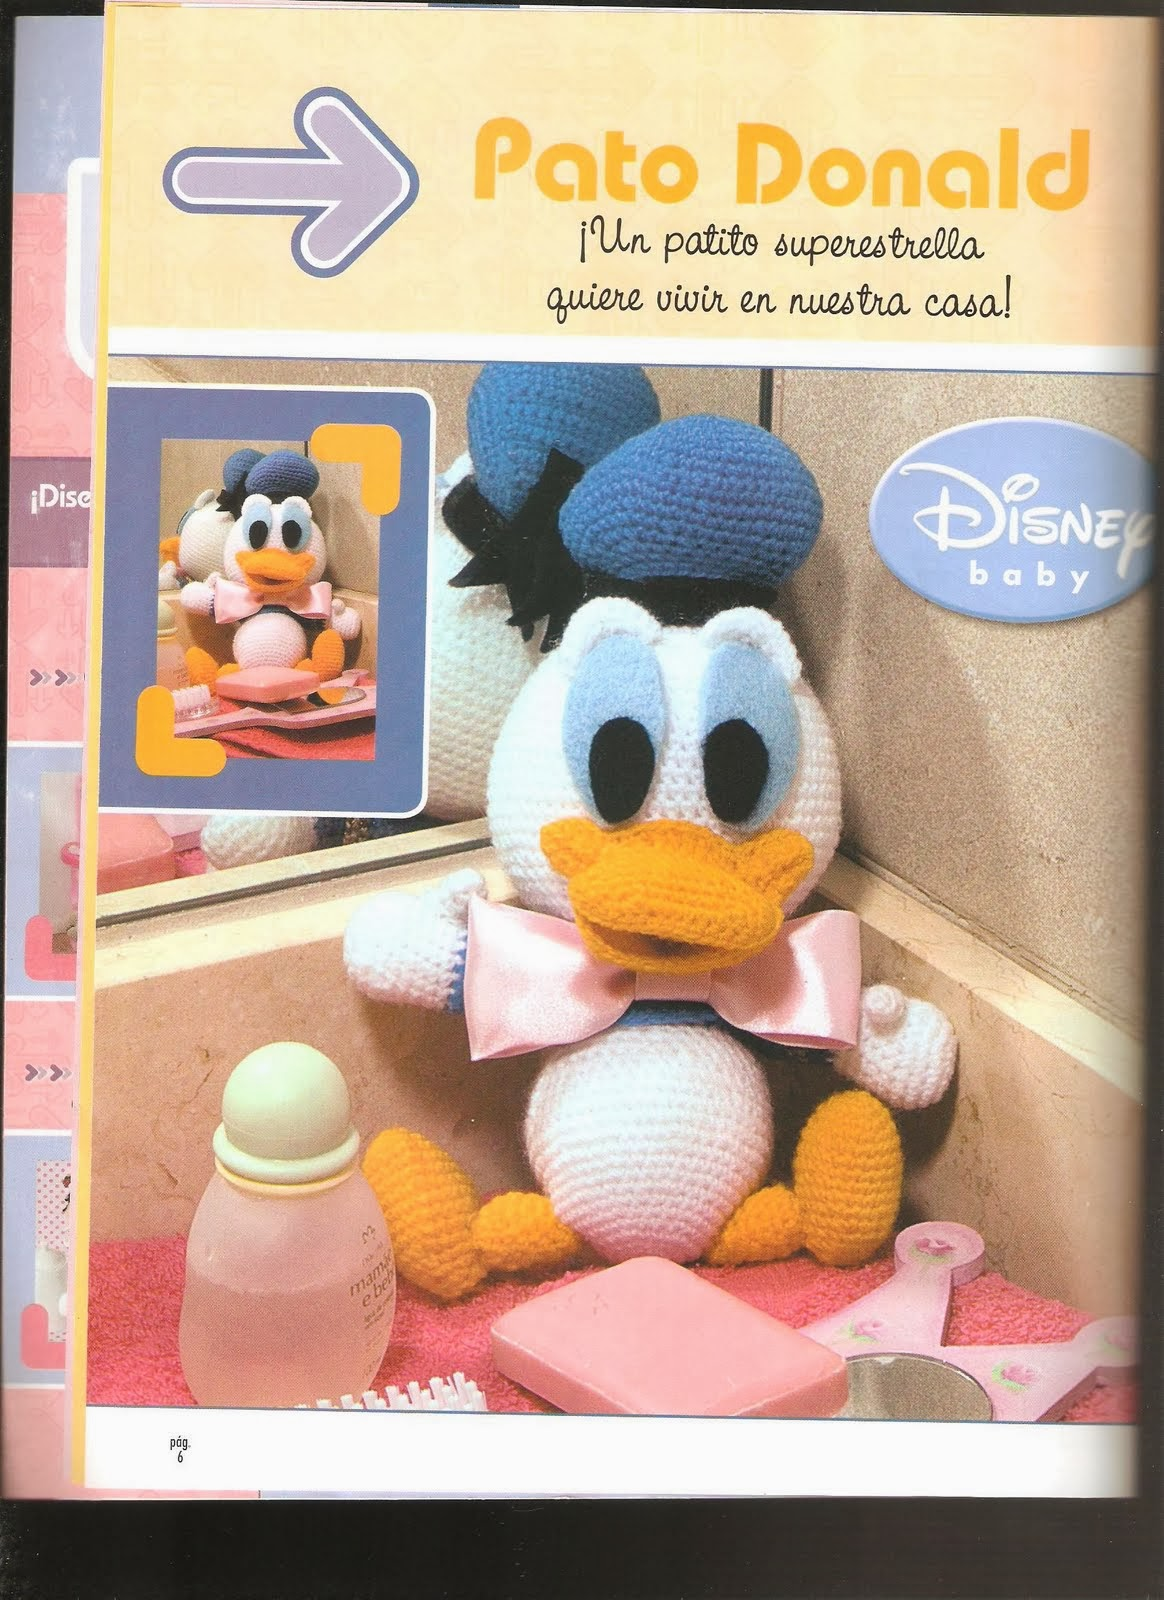 Como hacer Pato Donald en crochet - Revistas de manualidades Gratis